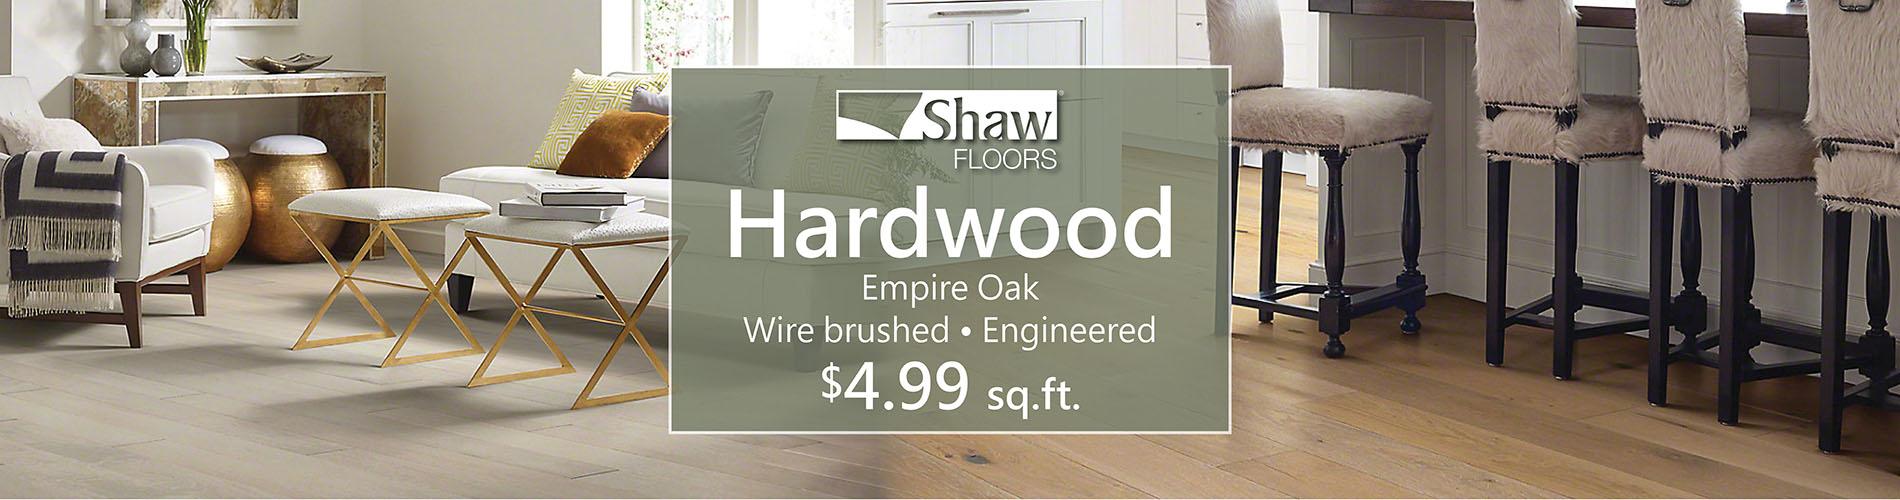 Shaw Hardwood - Empire Oak - Wire-Brushed * Engineered - $4.99 sq.ft.